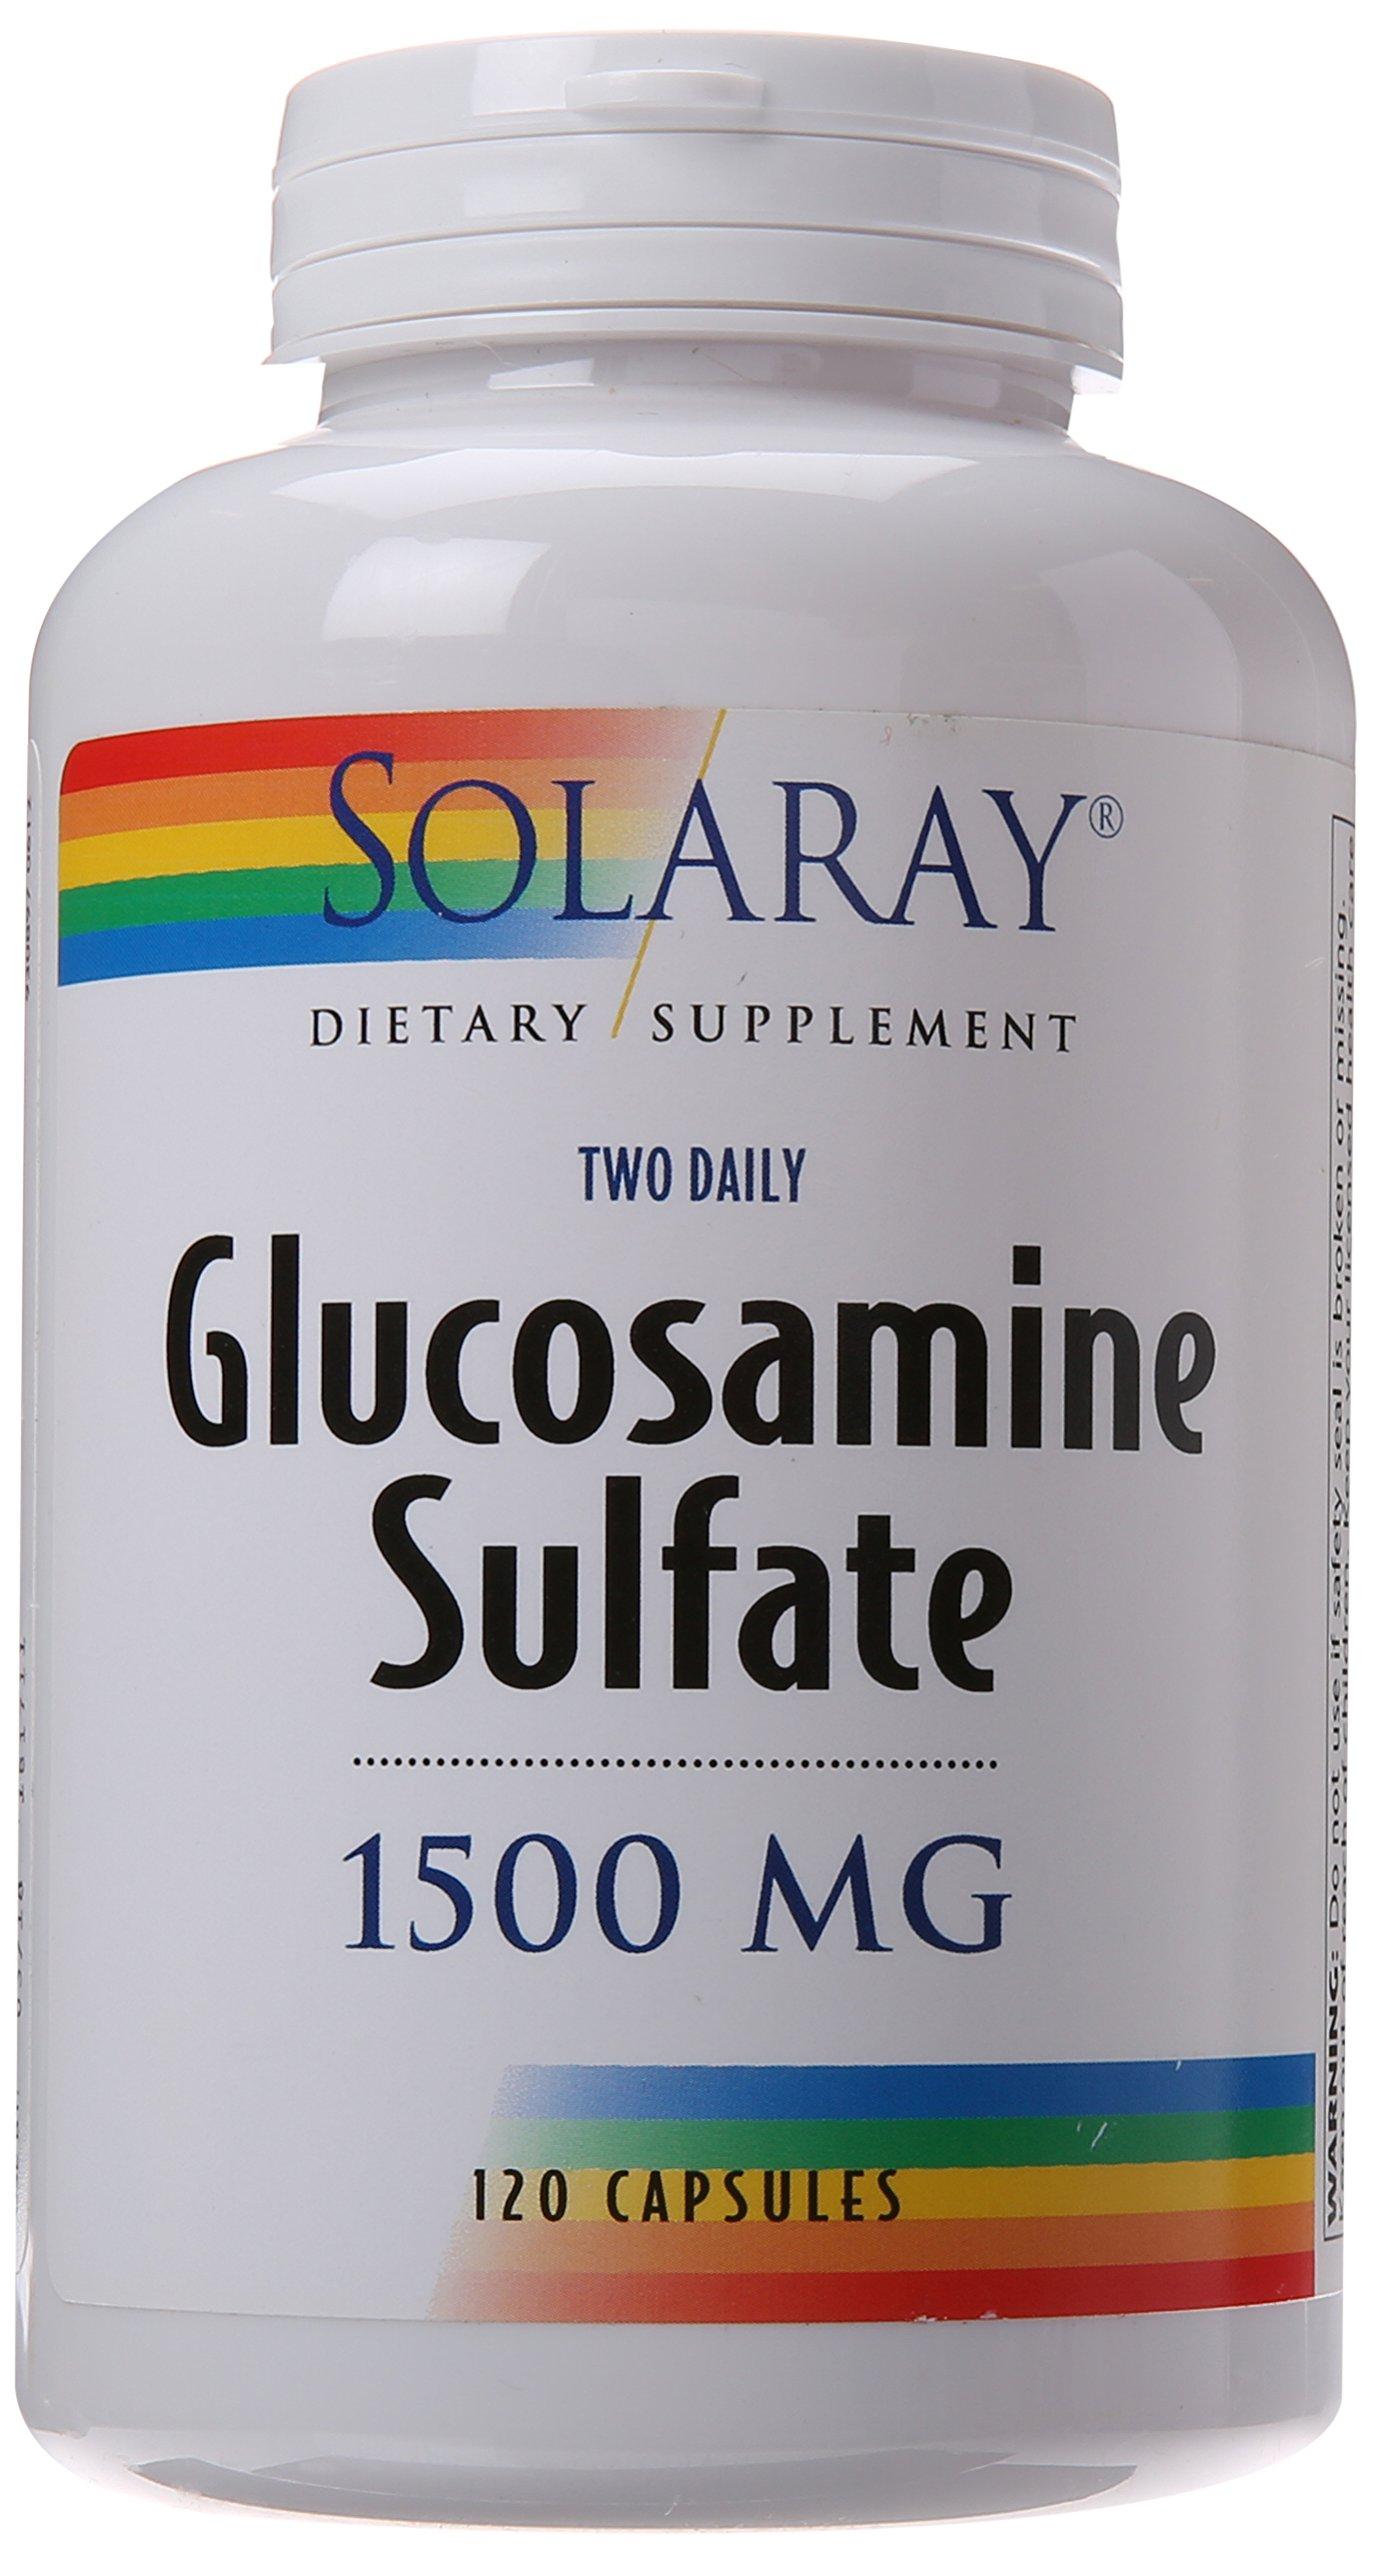 Solaray Glucosamine Sulfate Capsules, 1500mg, 120 Count by Solaray (Image #1)